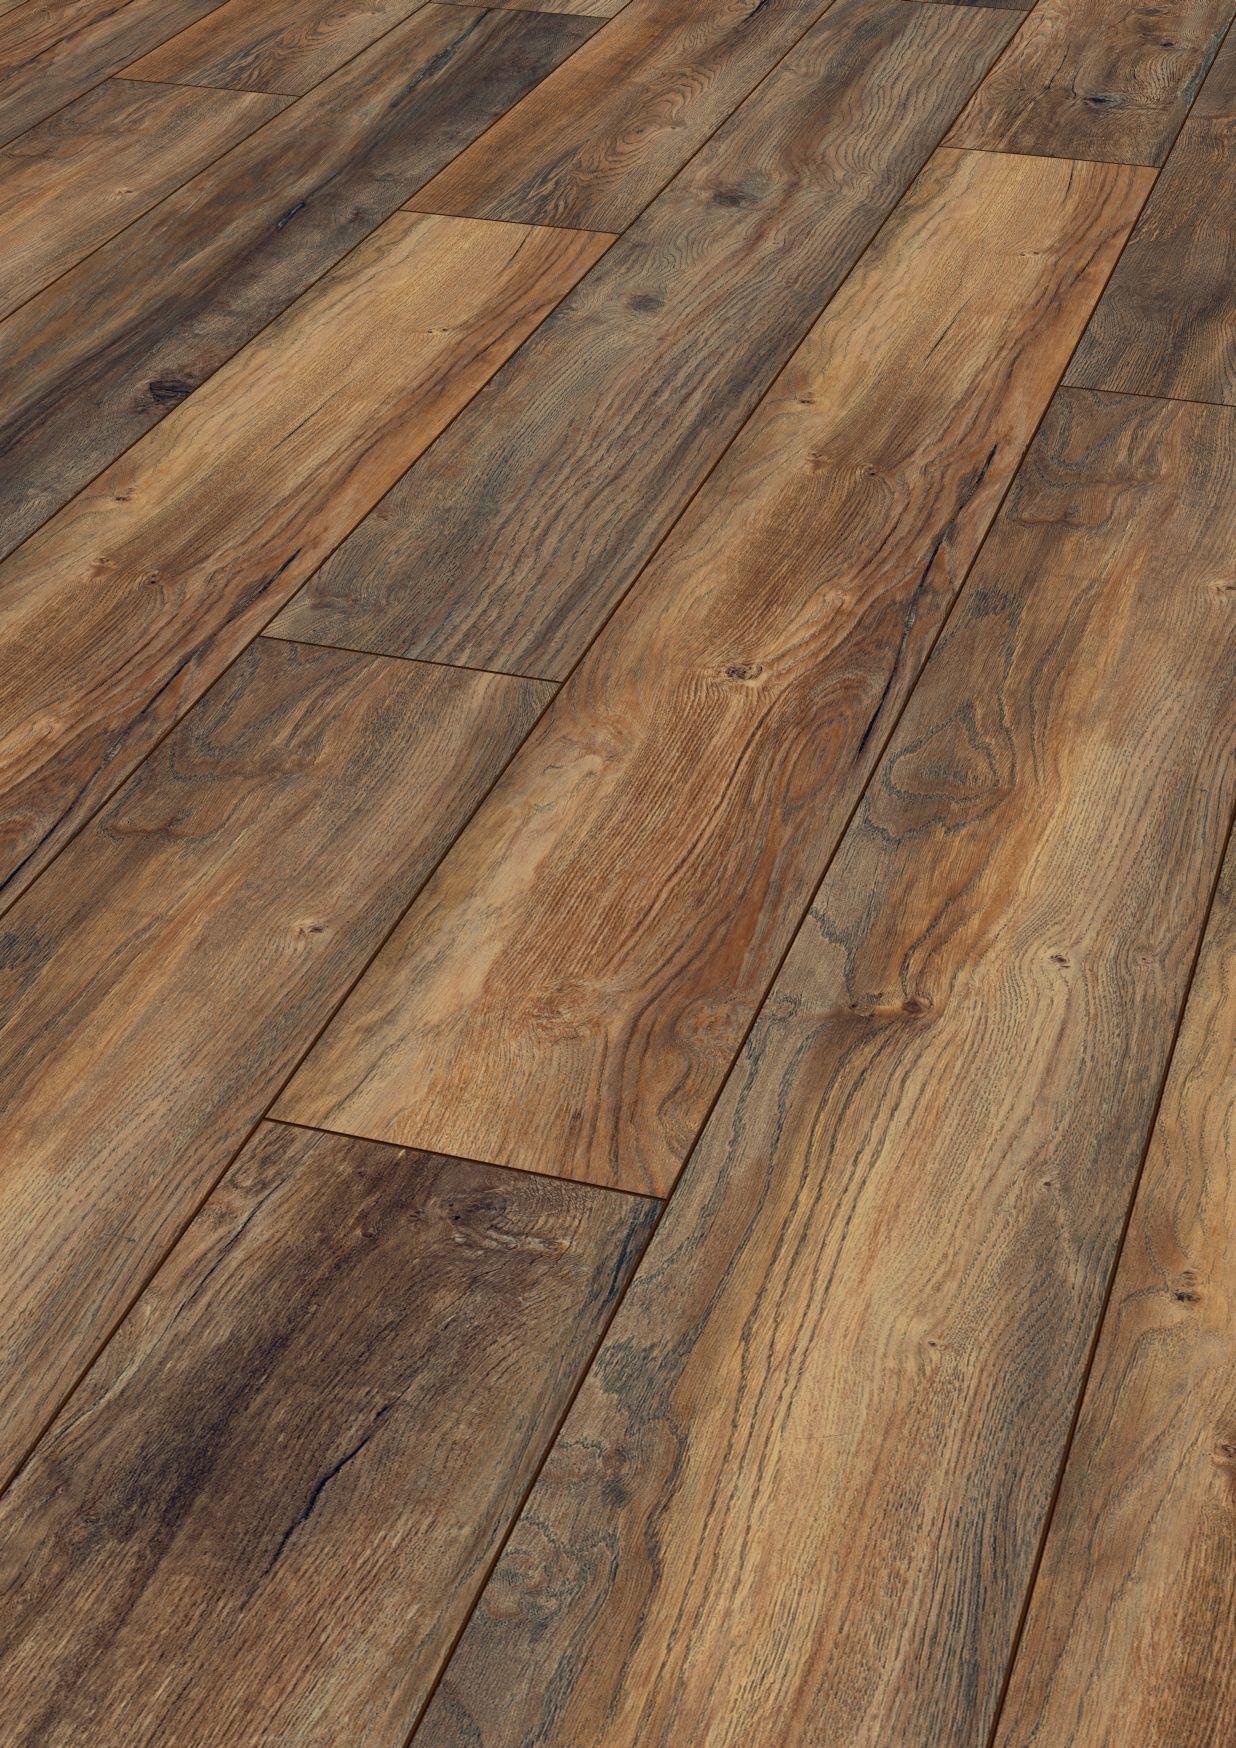 Hardwood Flooring Lincoln Ne Of Kronotex Amazon Harbour Oak with Kronotex Amazon Harbour Oak Aa Floors toronto